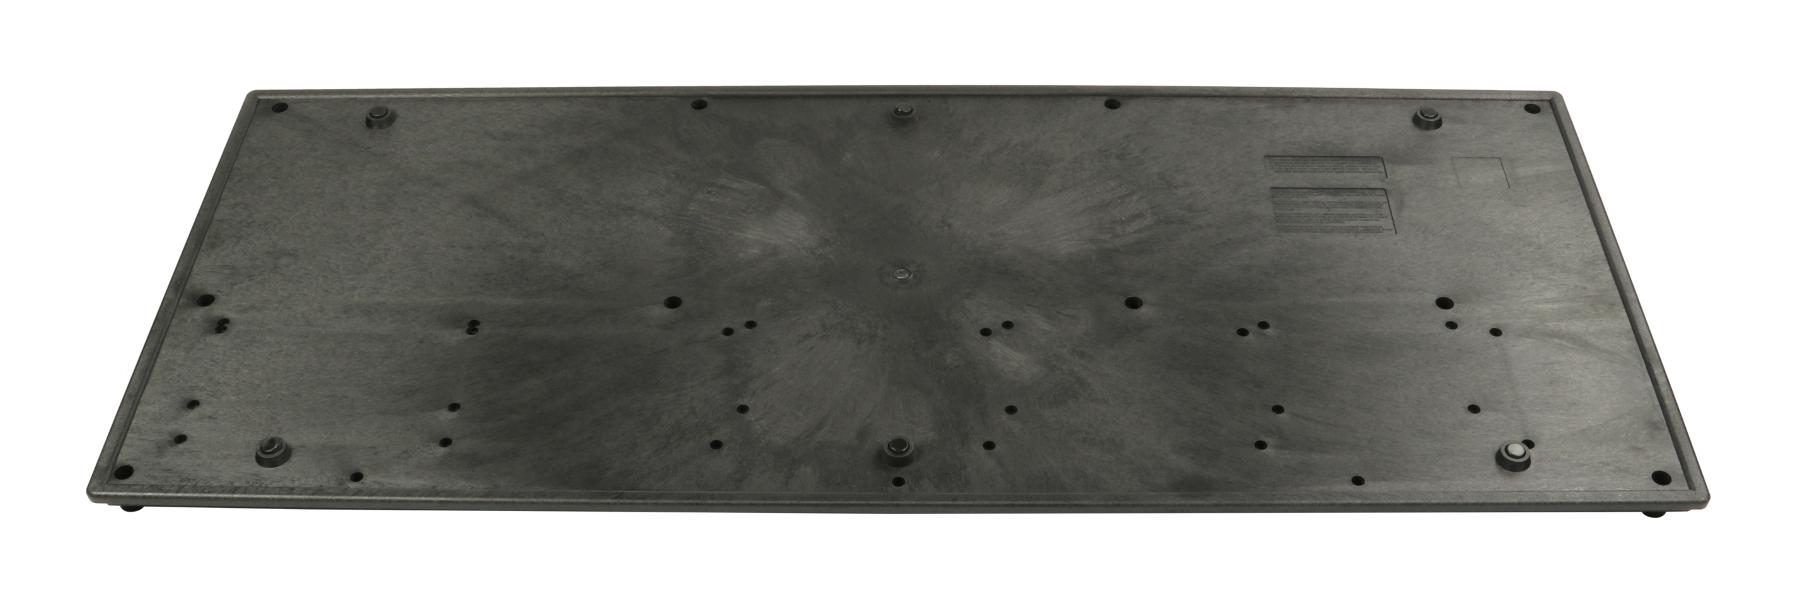 Studiologic 41510890  Sledge Bottom Panel with Feet 41510890